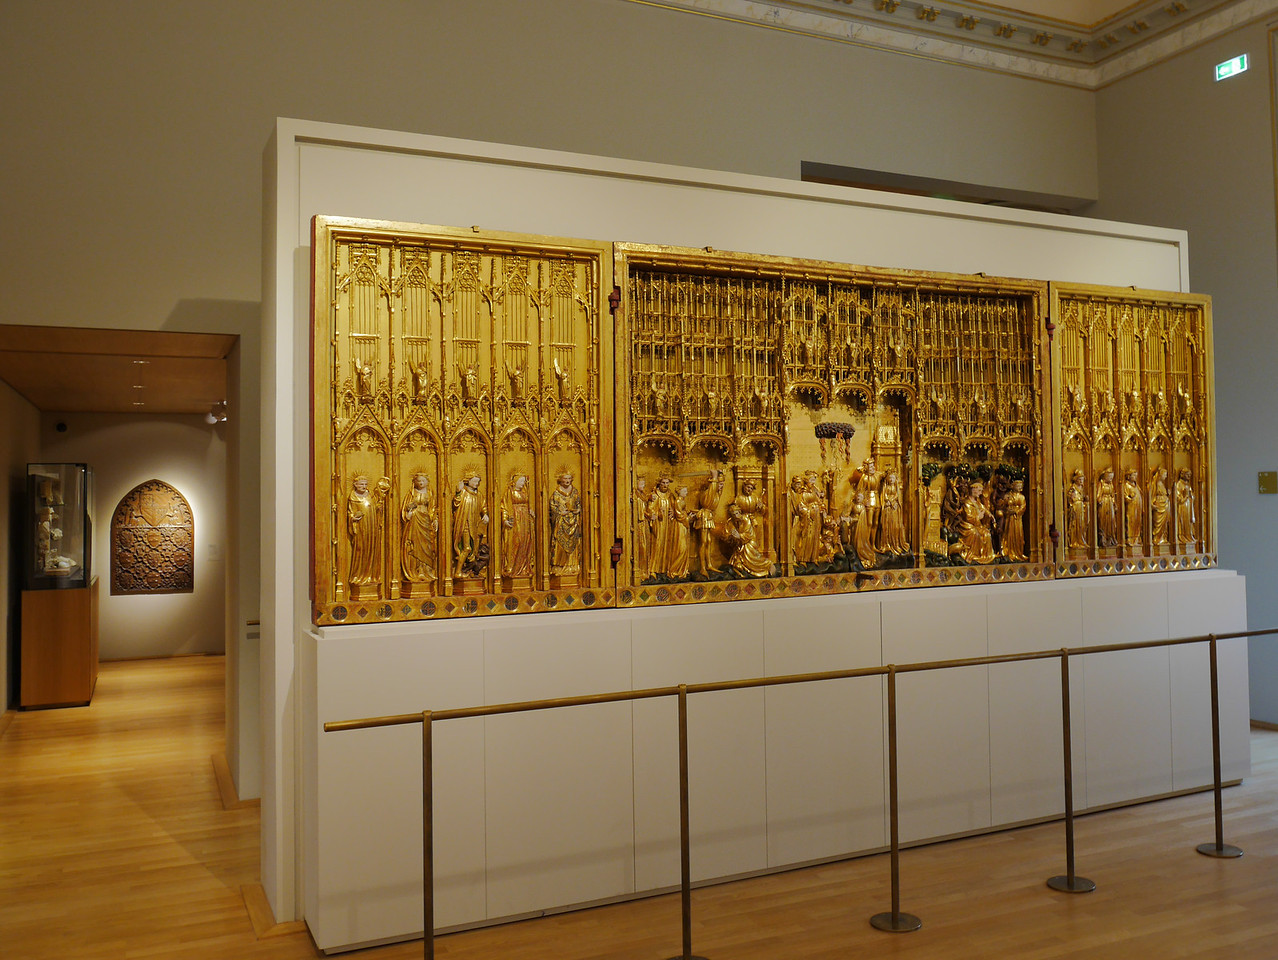 Dijon Beaux Arts Museum - The Saints and Martyrs Altarpiece